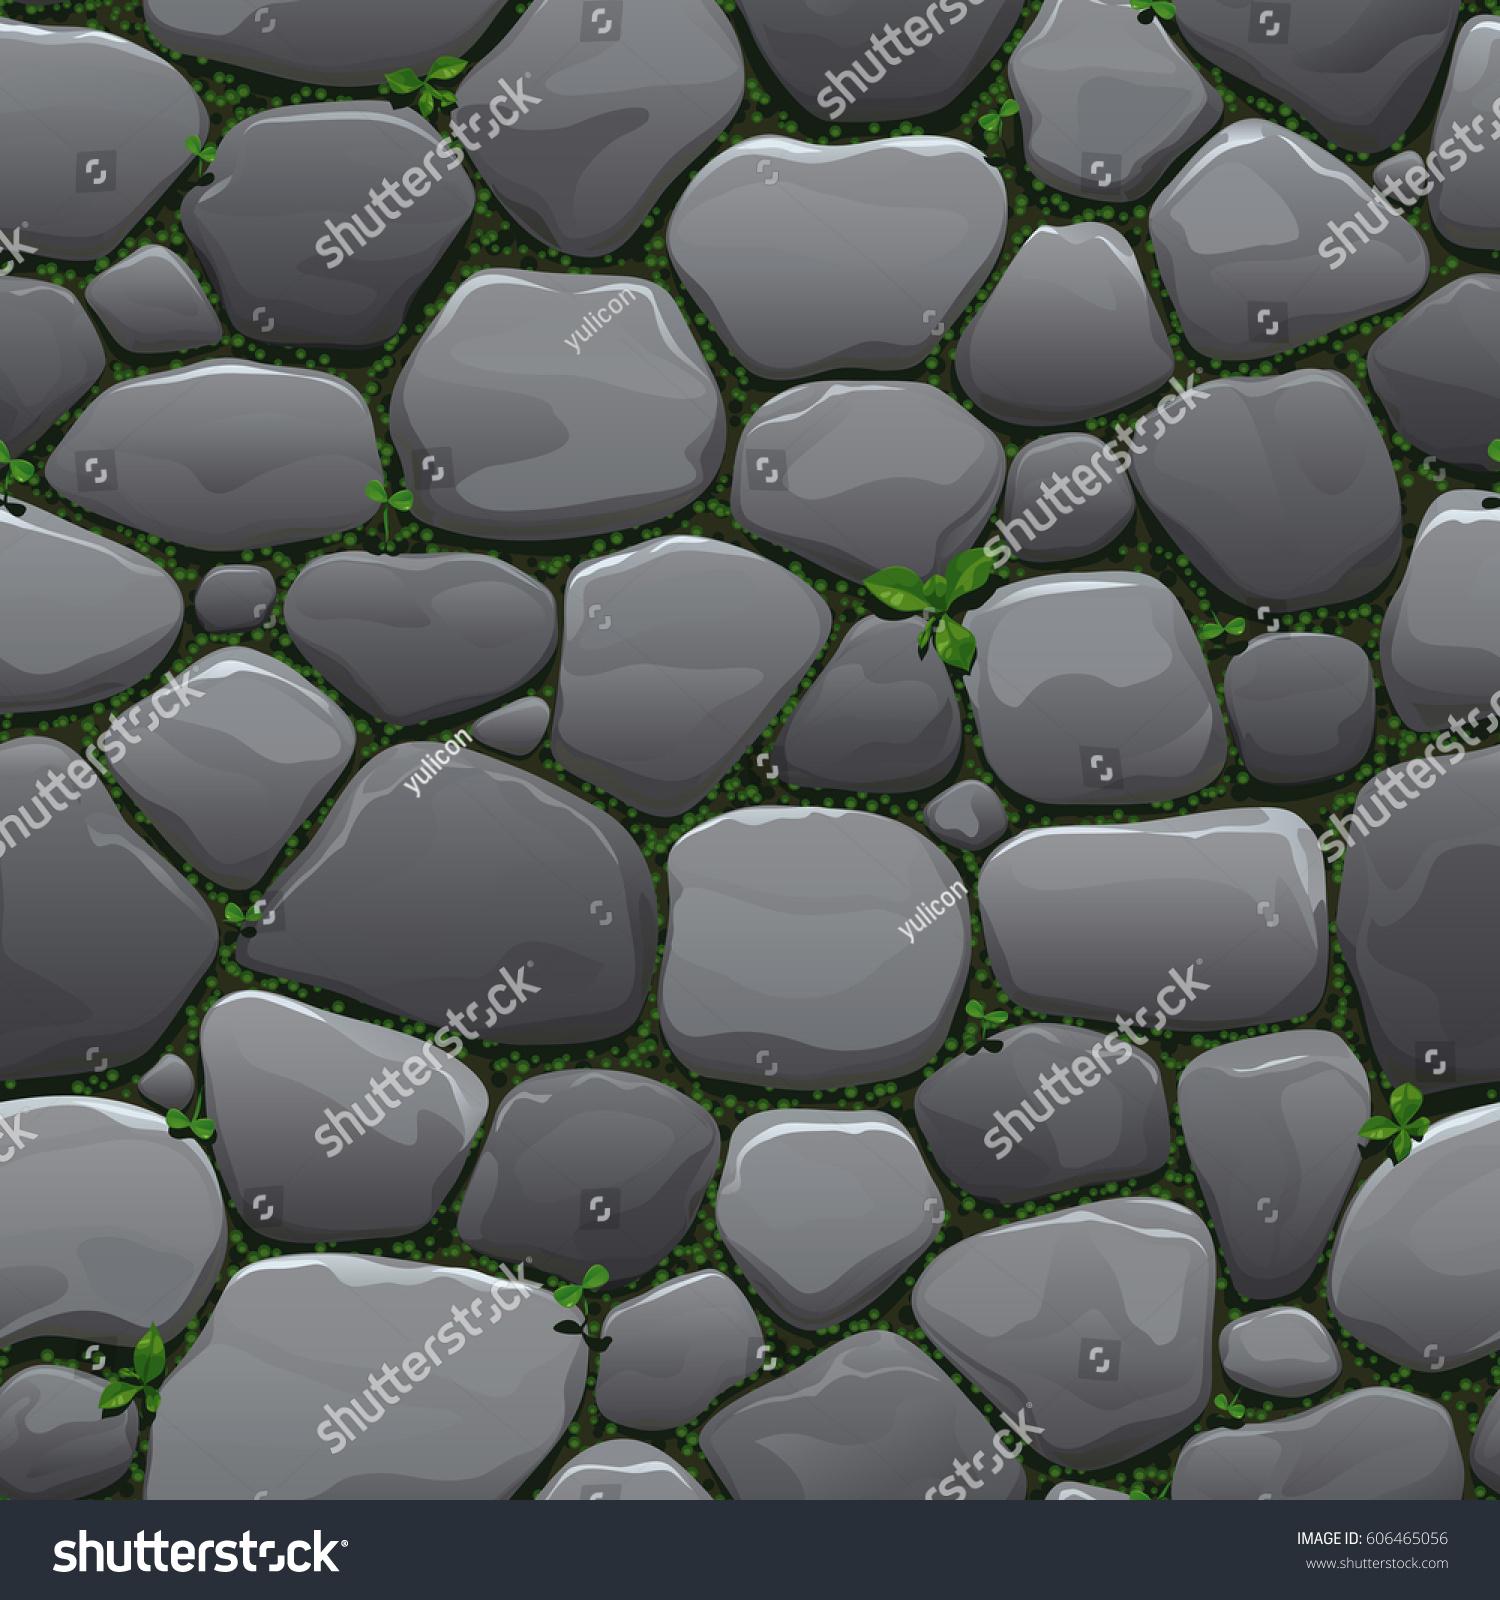 cartoon square stones texture - photo #13